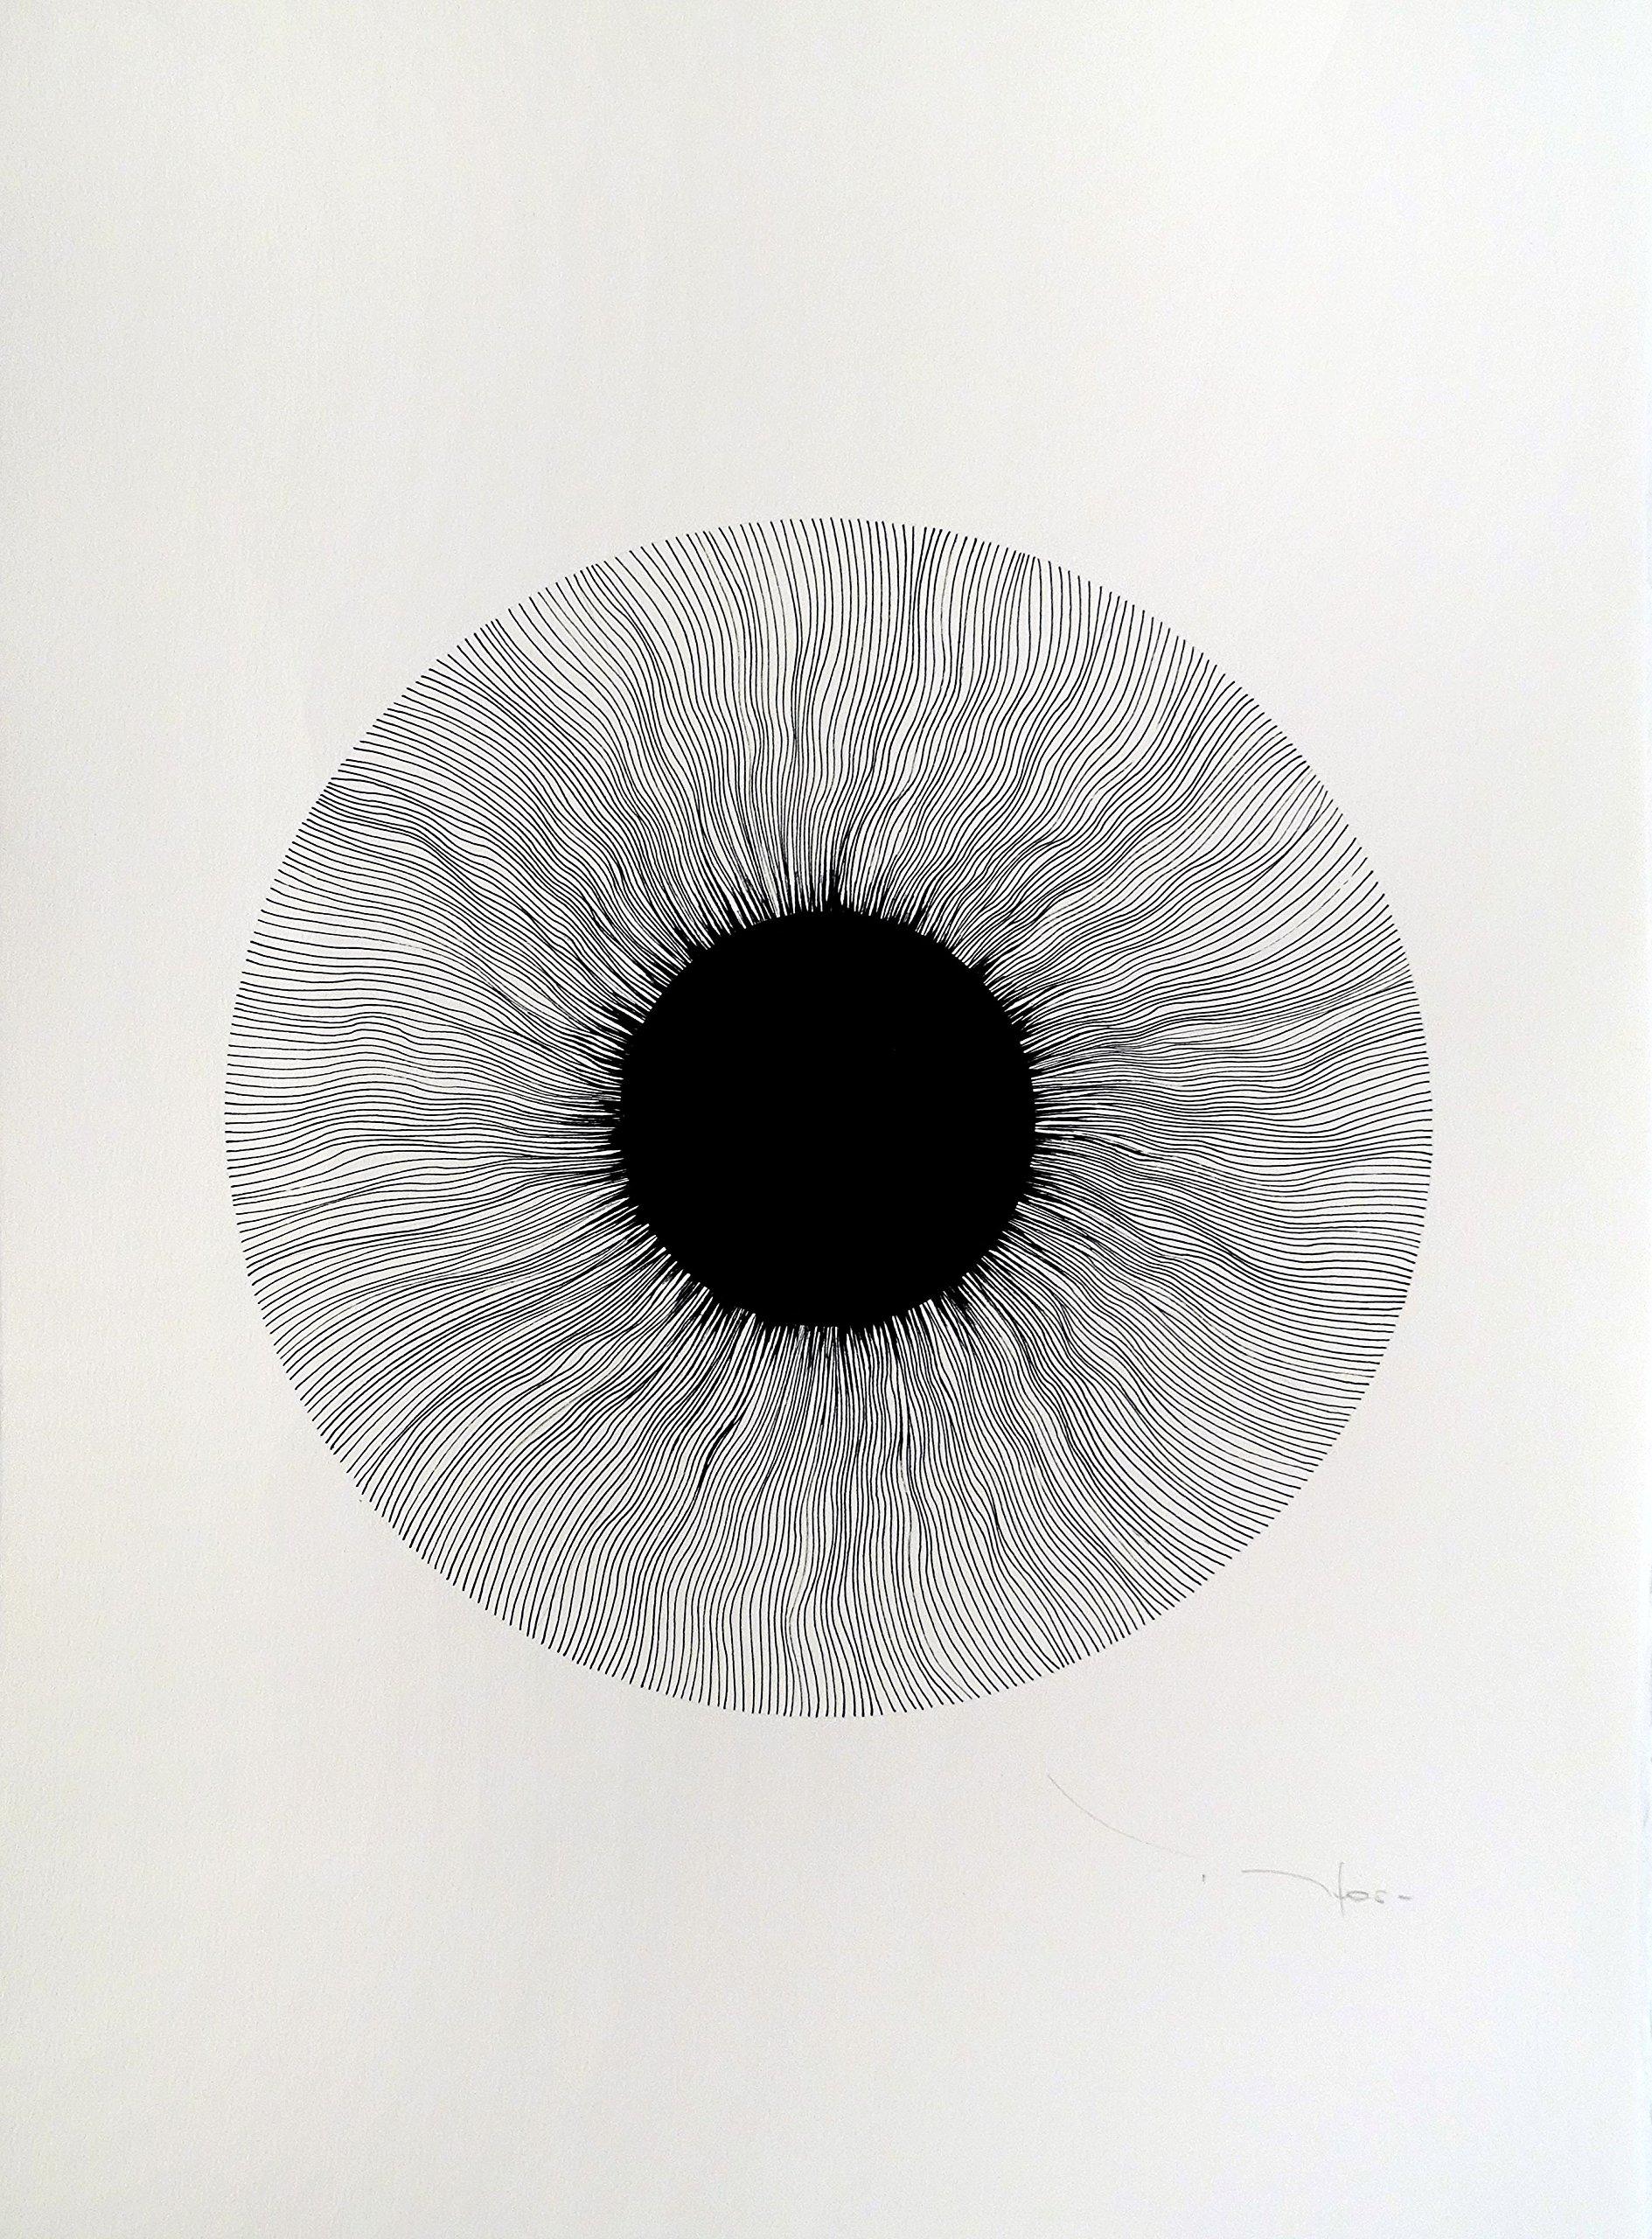 Tehos - Black eye 05 by